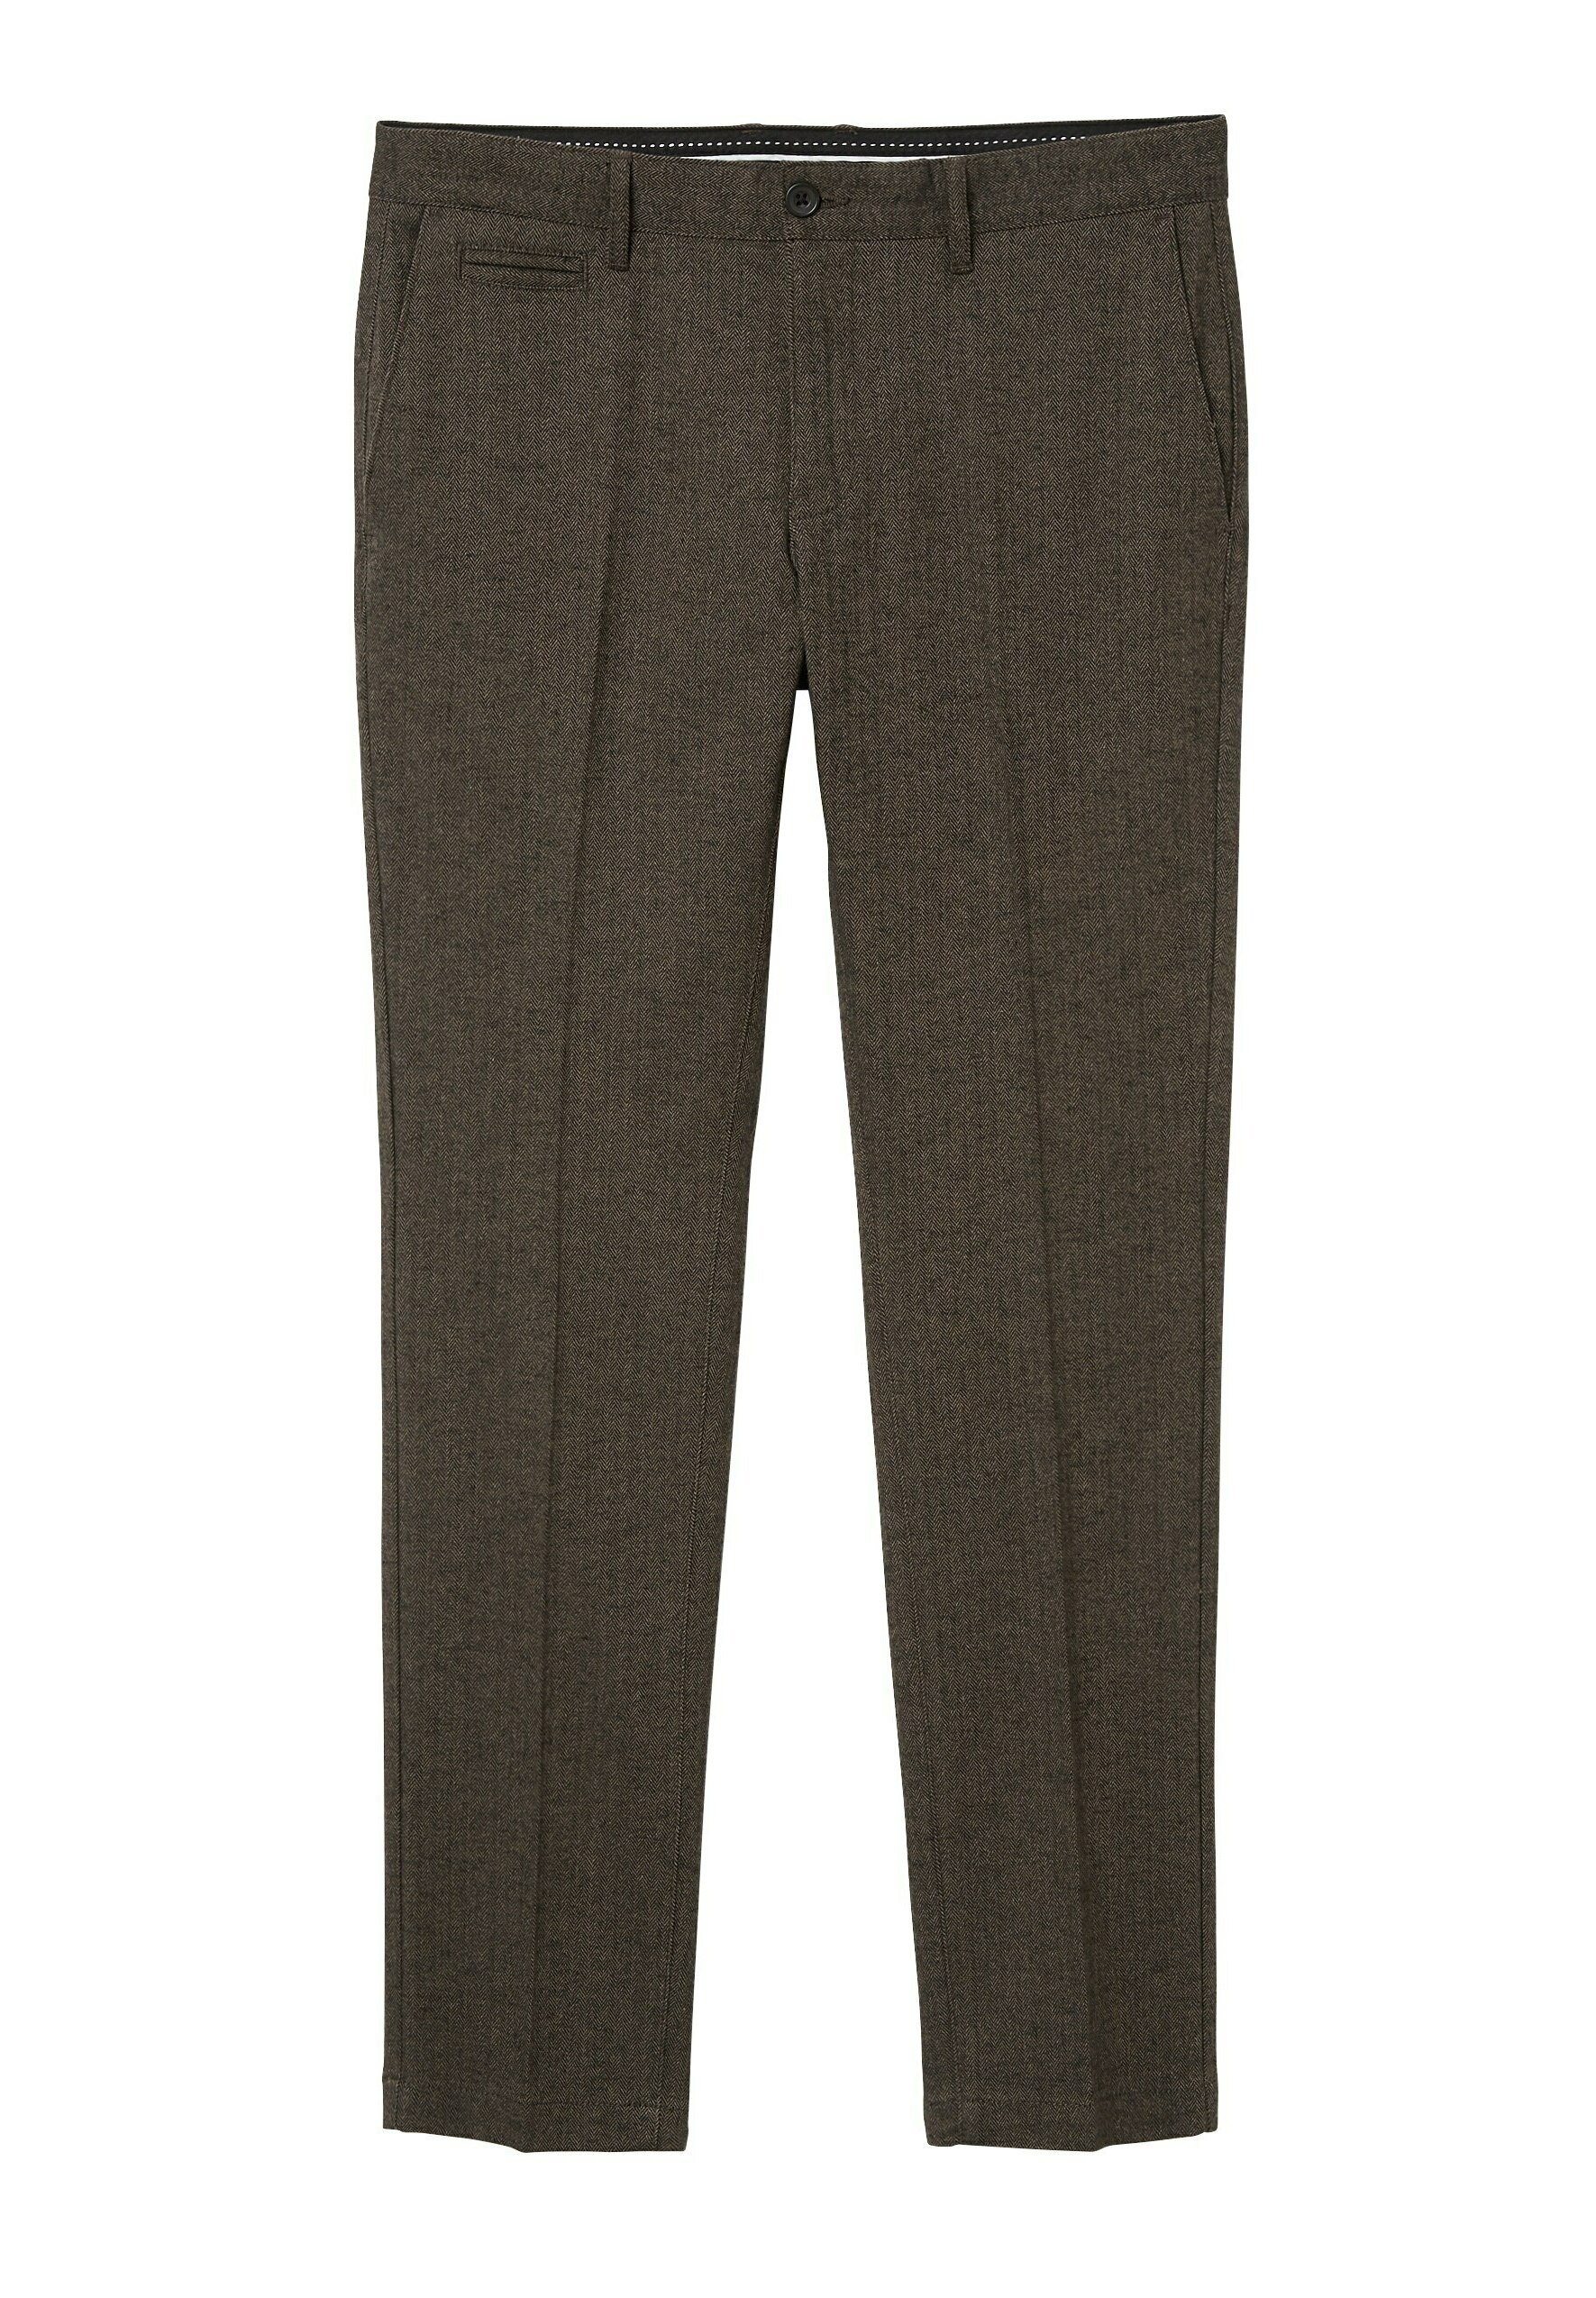 Homme GEORGE SLACKS - Pantalon de costume